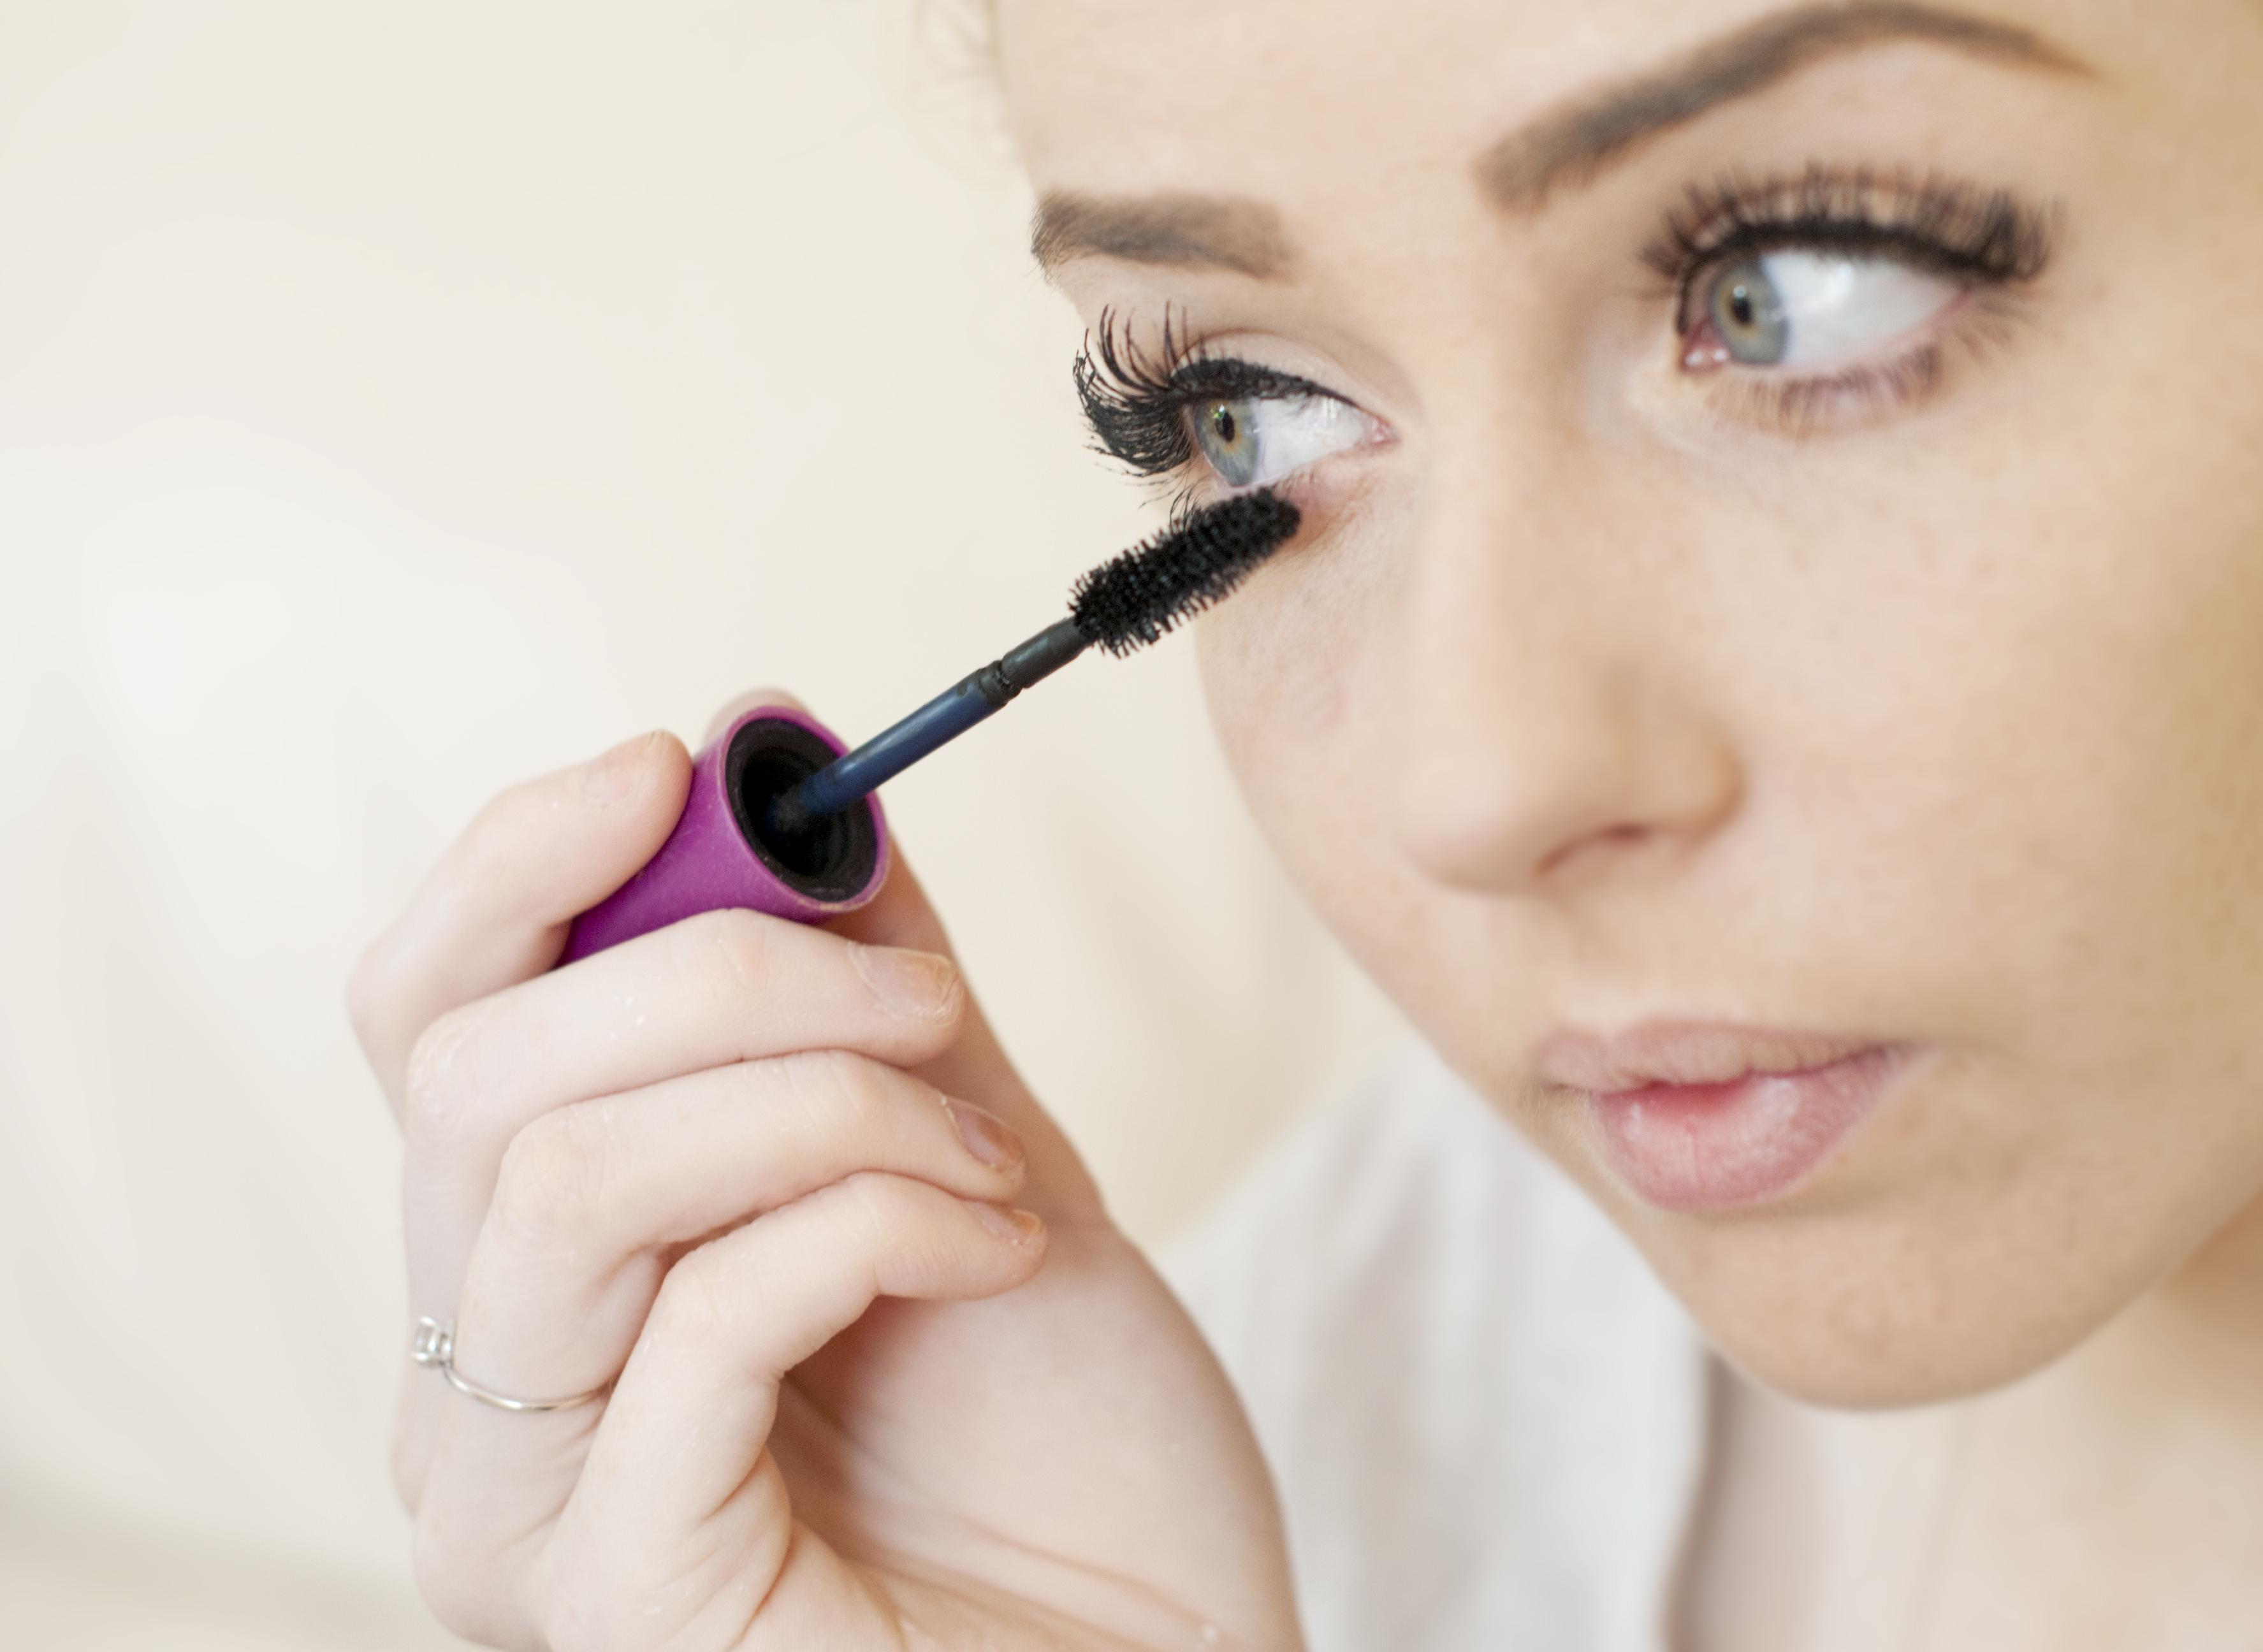 Young european woman applying mascara make-up to her eyelashes